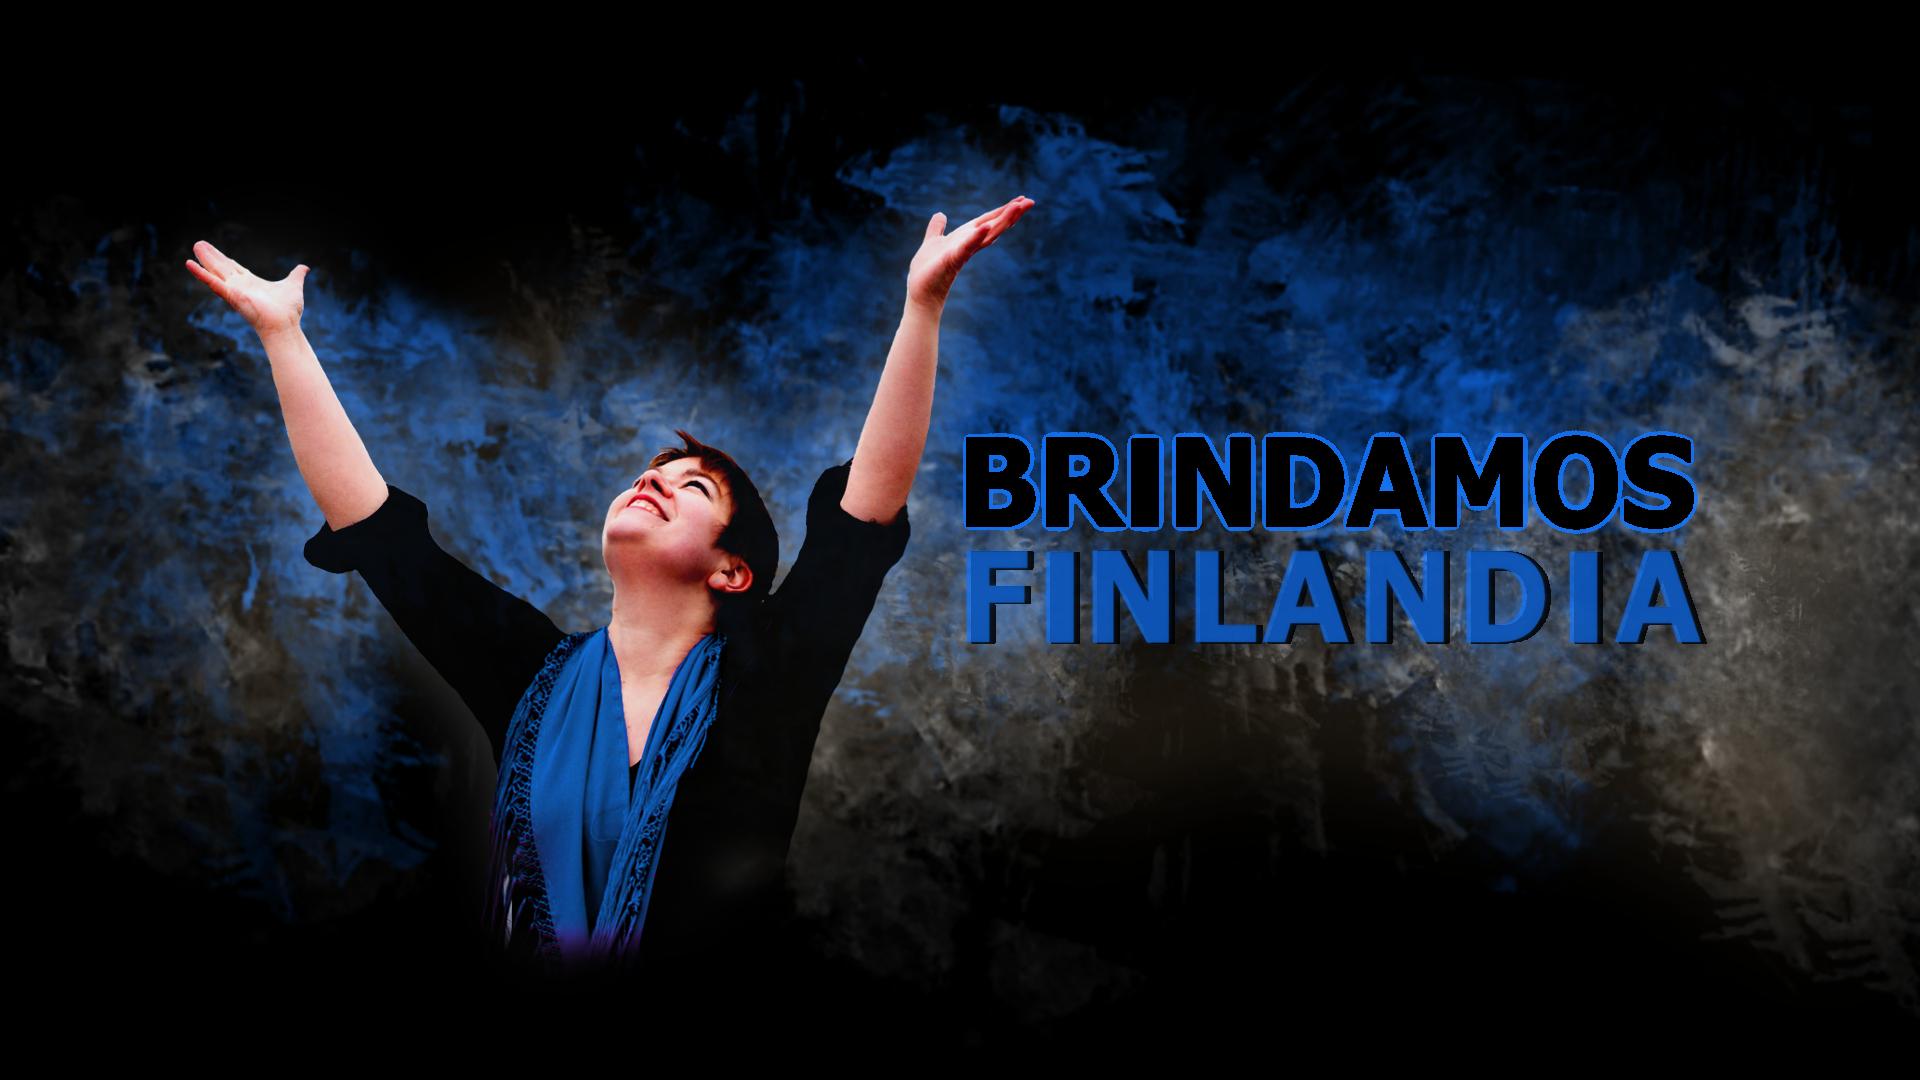 BRINDAMOS FINLANDIA EVENTS 2019TOVE